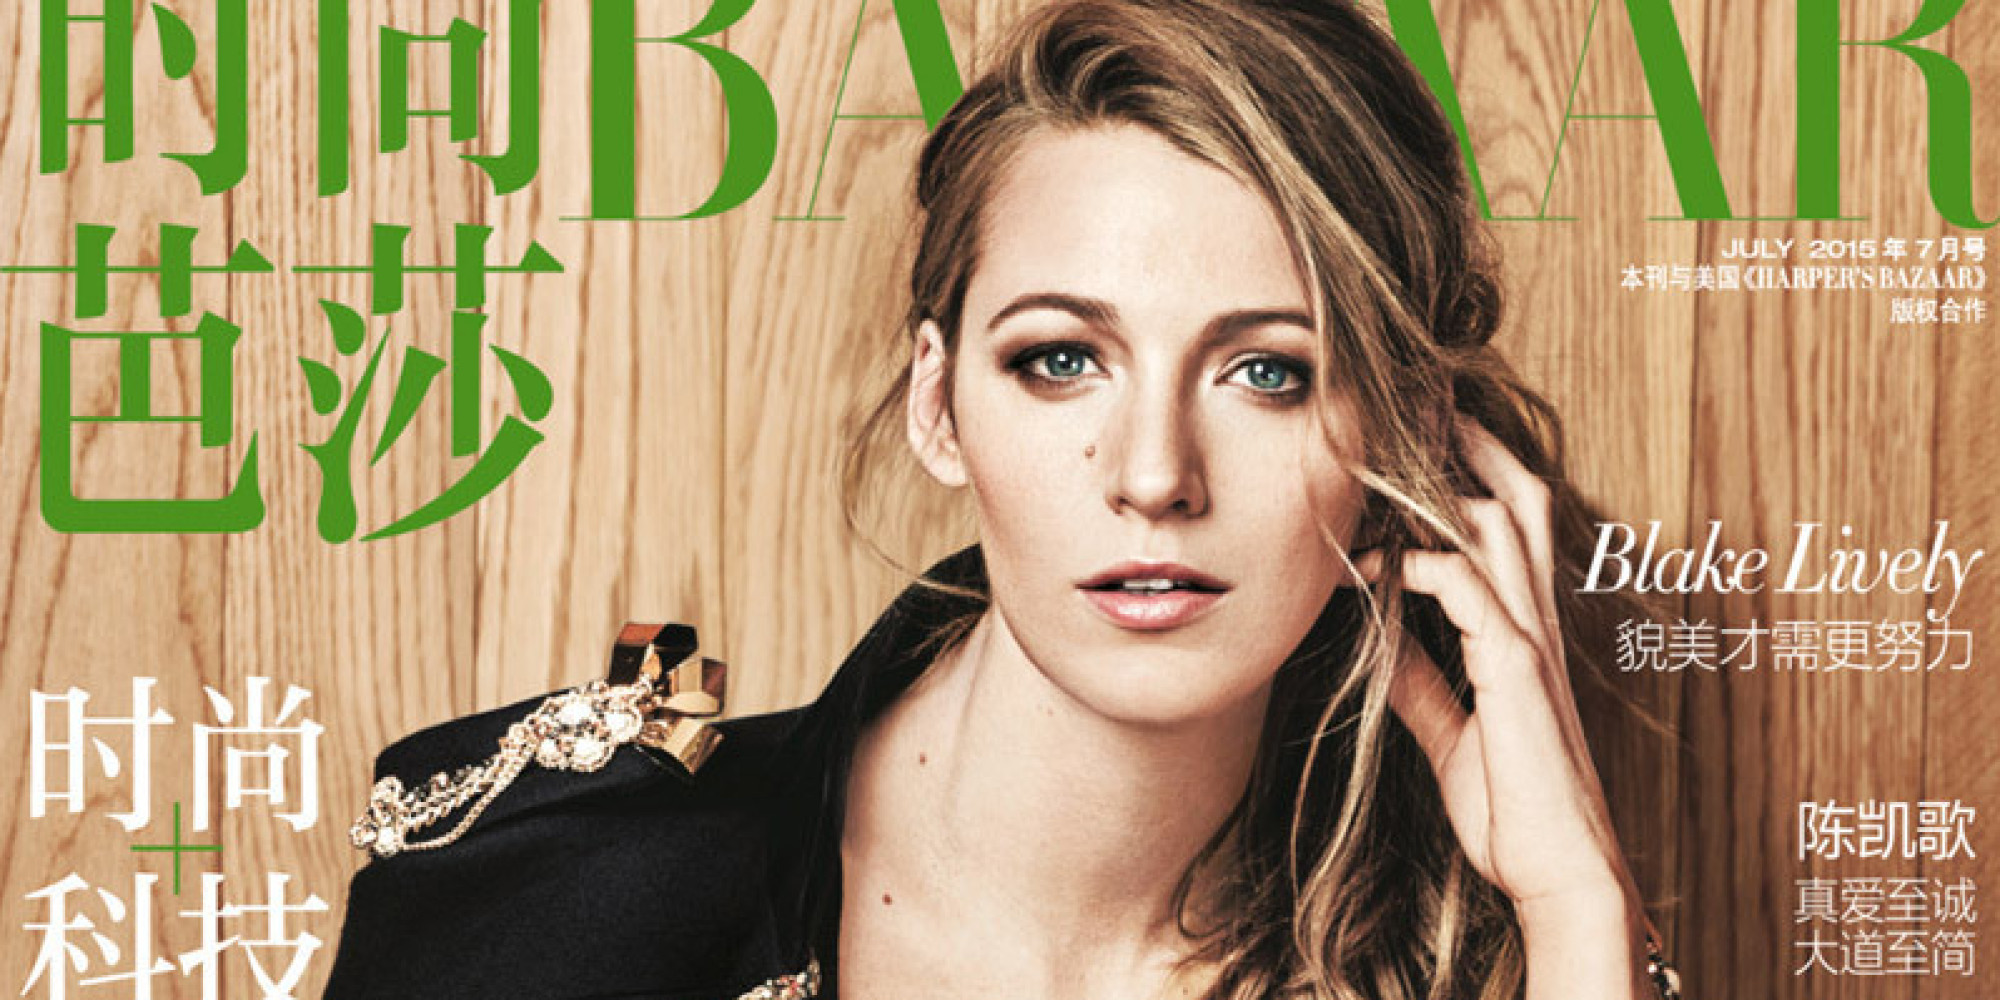 Blake Lively Is Elegant And Lovely On The Cover Of Harper ... Blake Lively Facebook